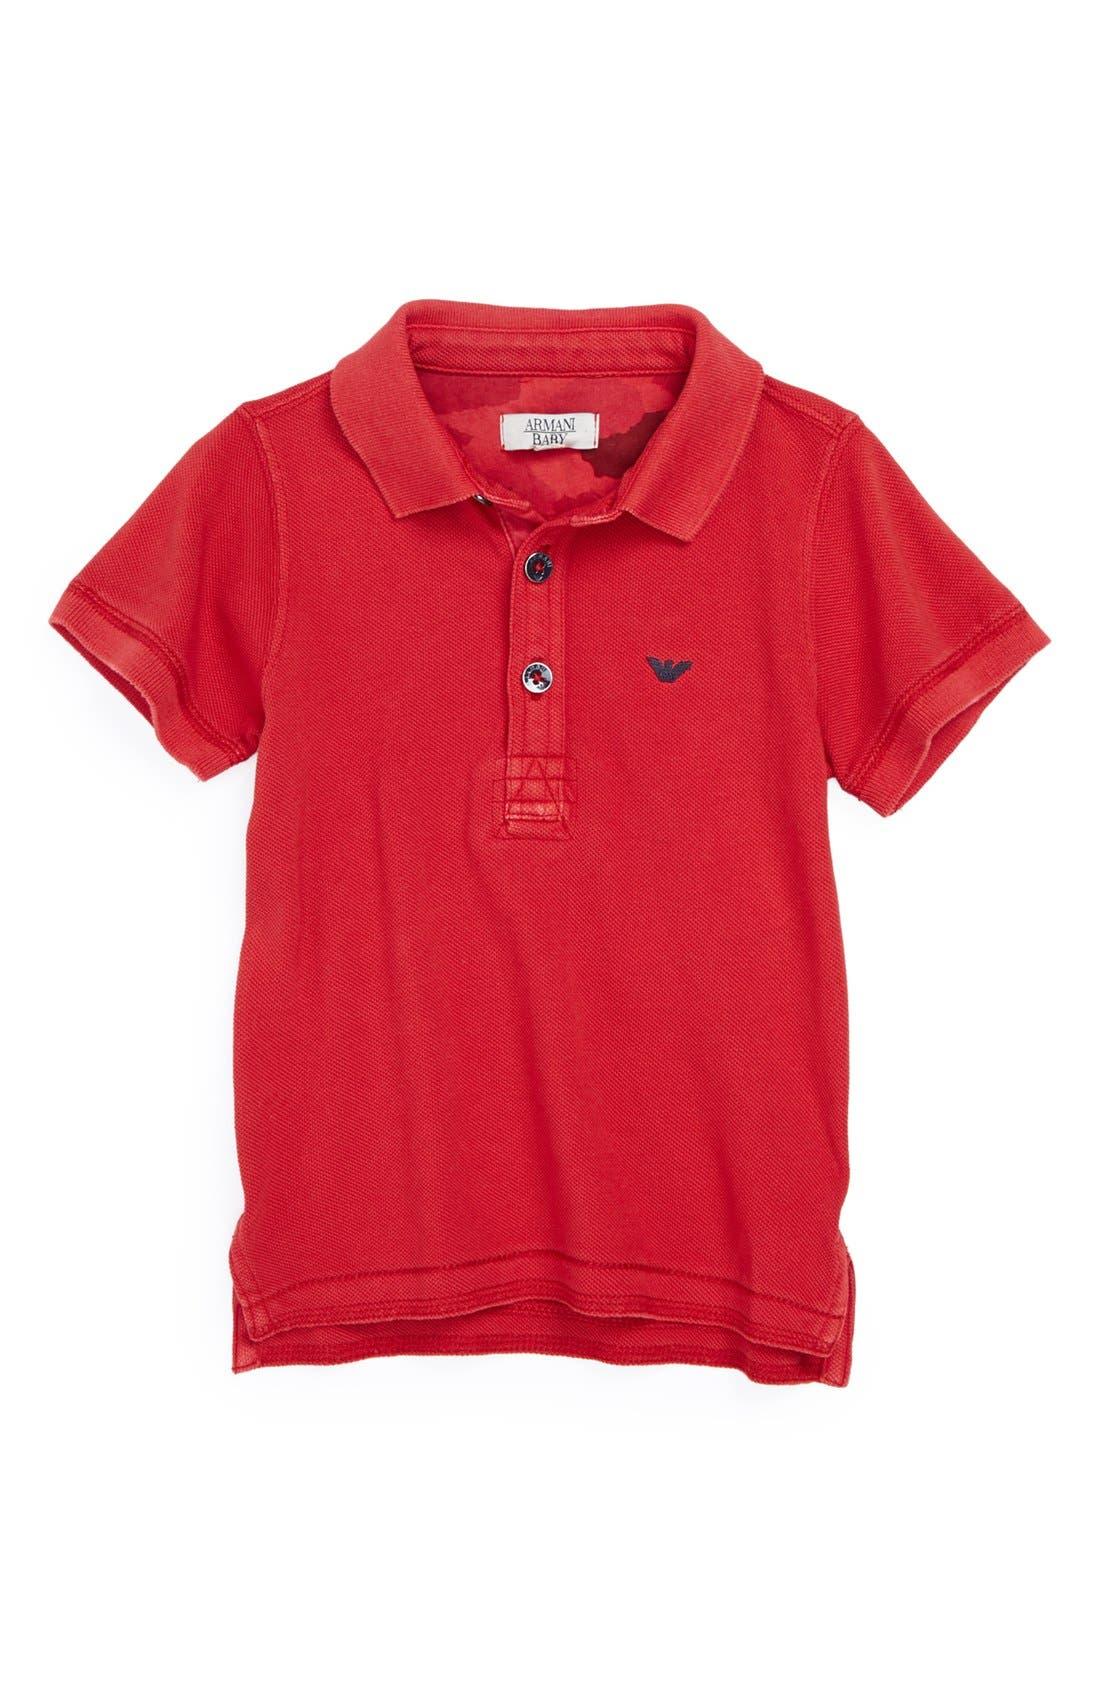 Main Image - Armani Junior Cotton Logo Polo (Baby Boys)